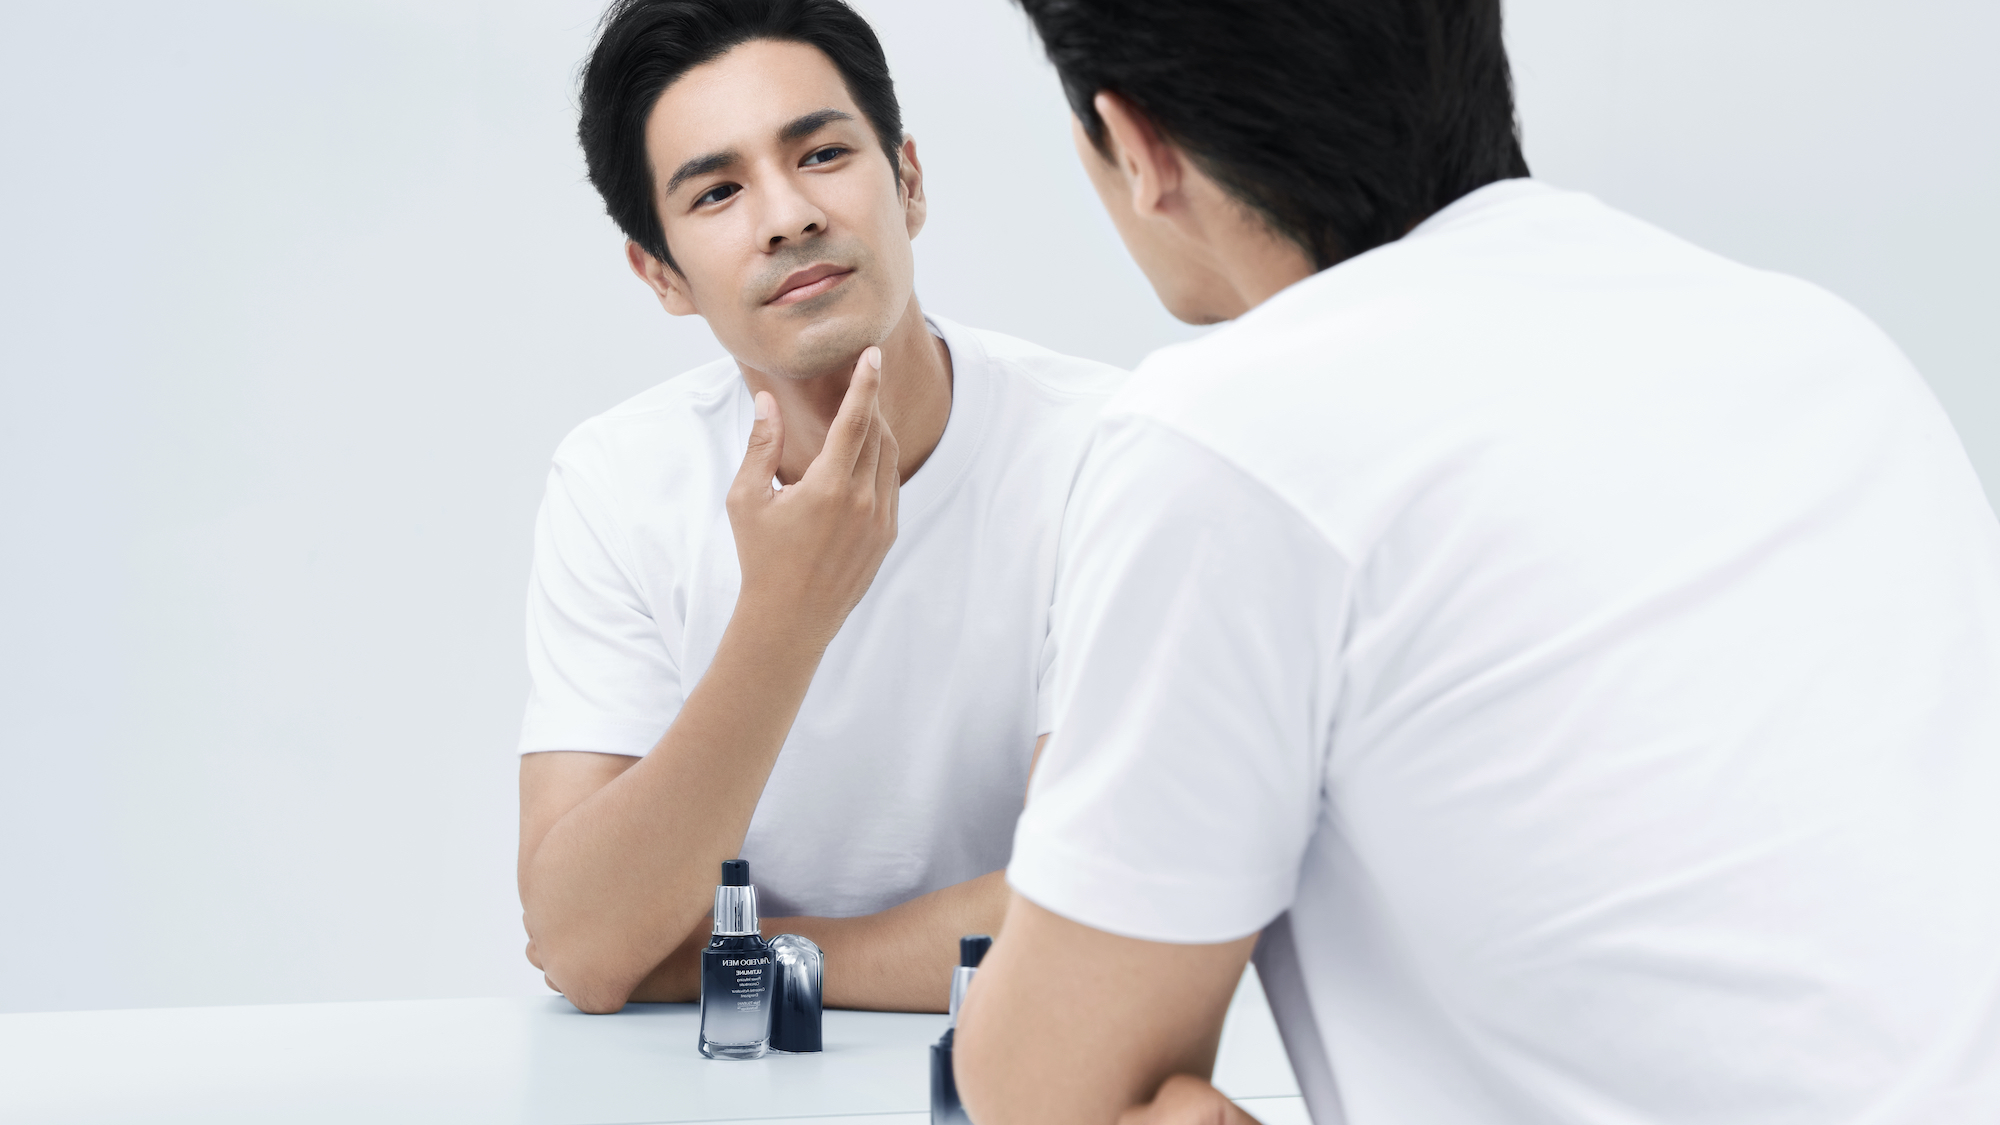 Shiseido prodotti cura viso uomo